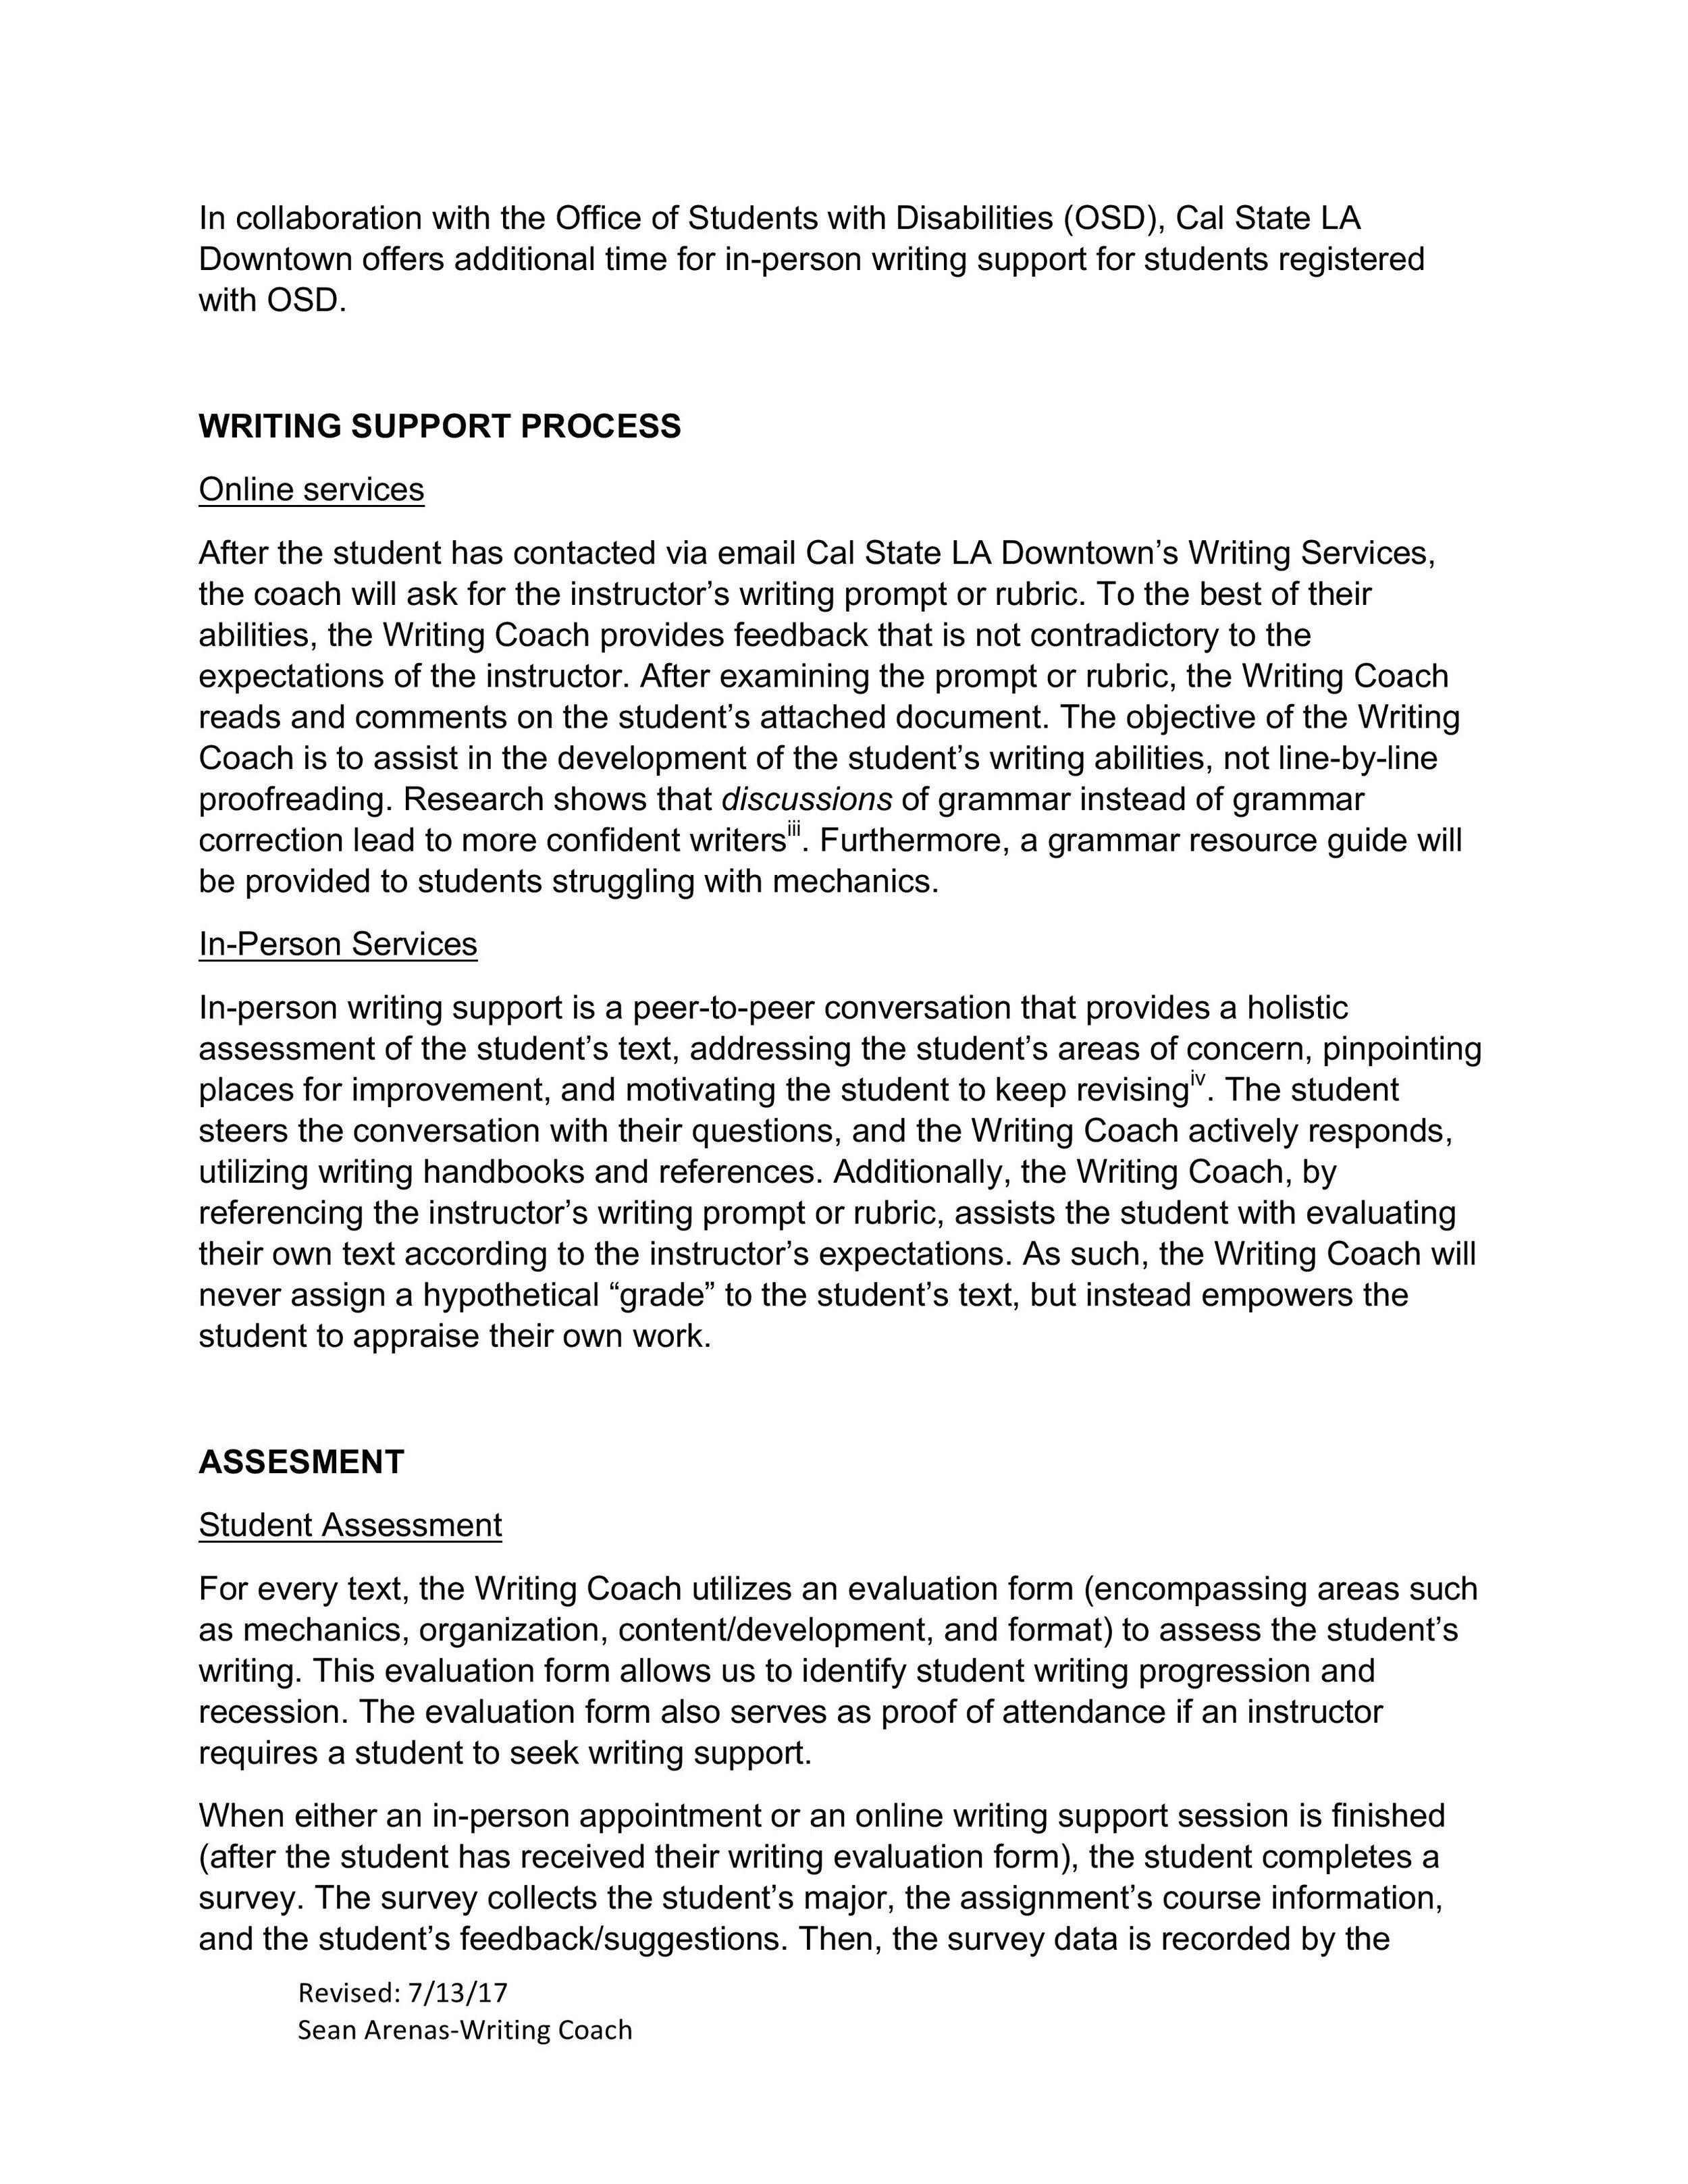 SEAN ARENAS_ADMINISTRATIVE_MANUAL-page-002.jpg